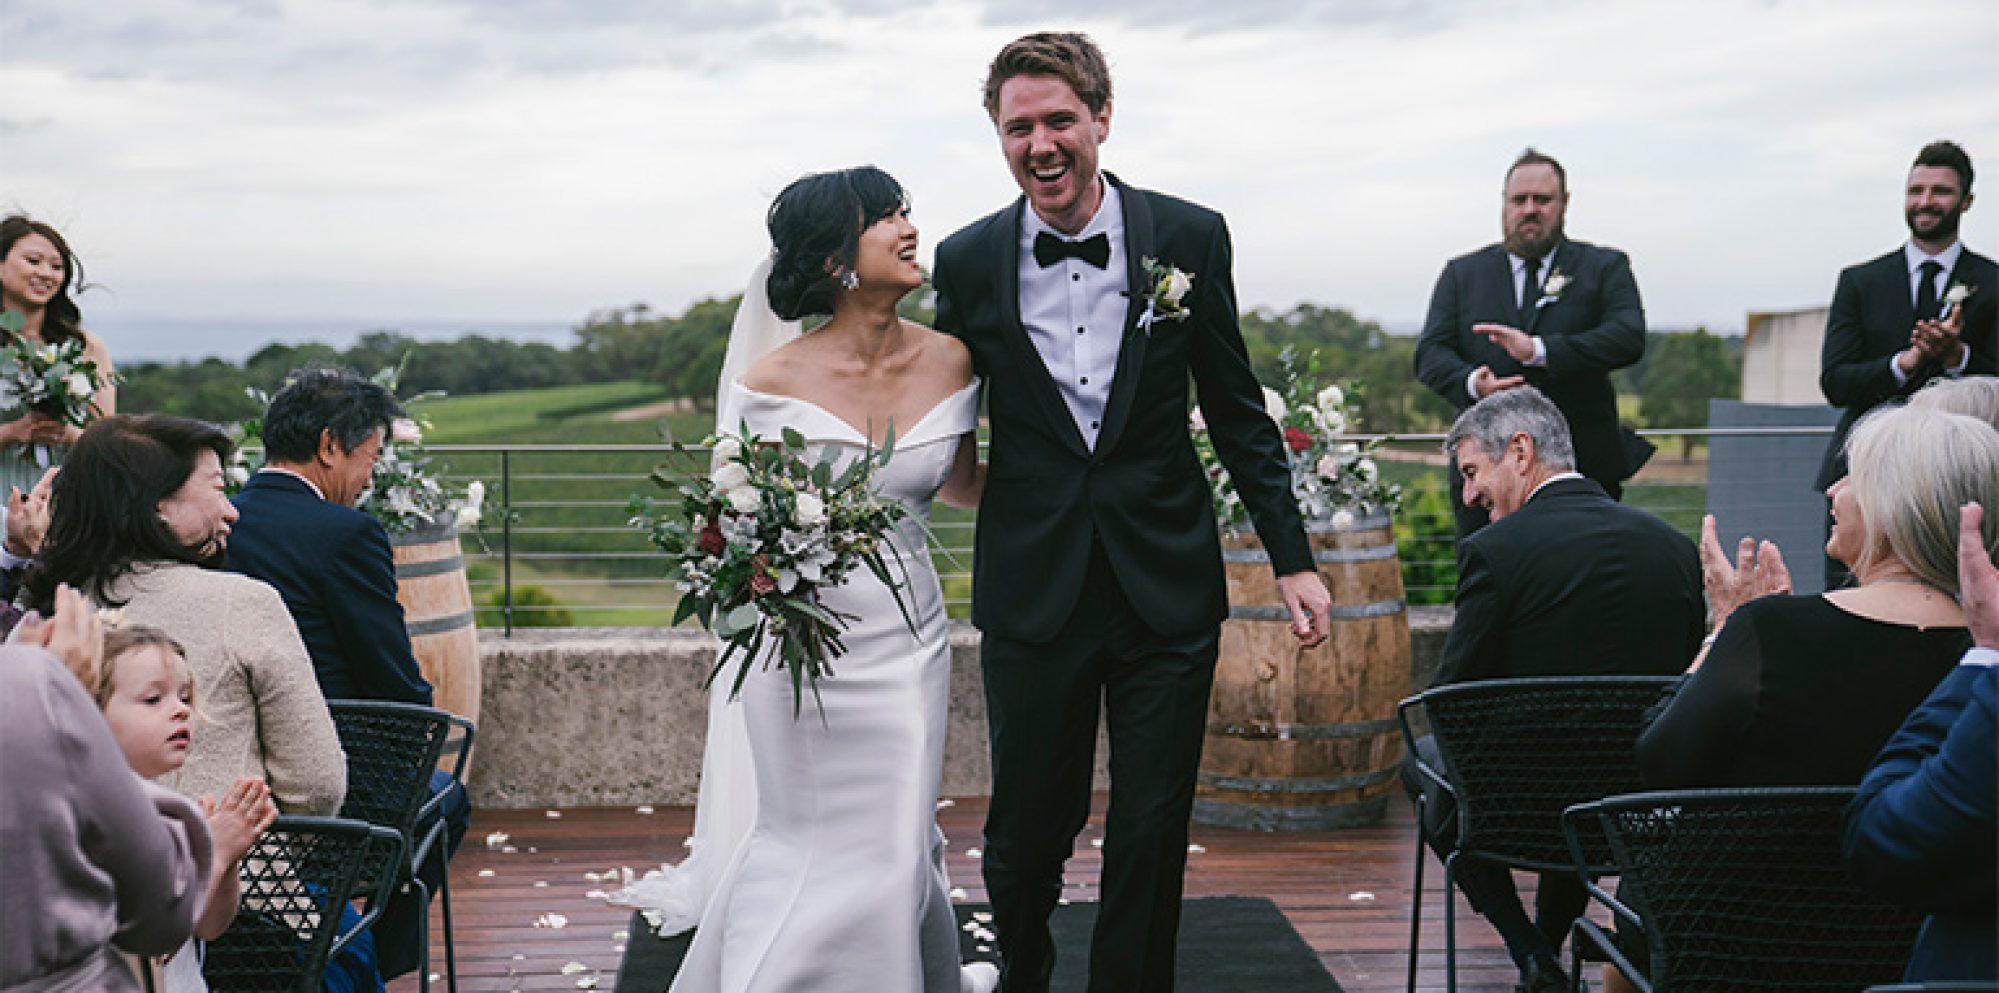 Sandy & daniel wedding videography @ port phillip estate